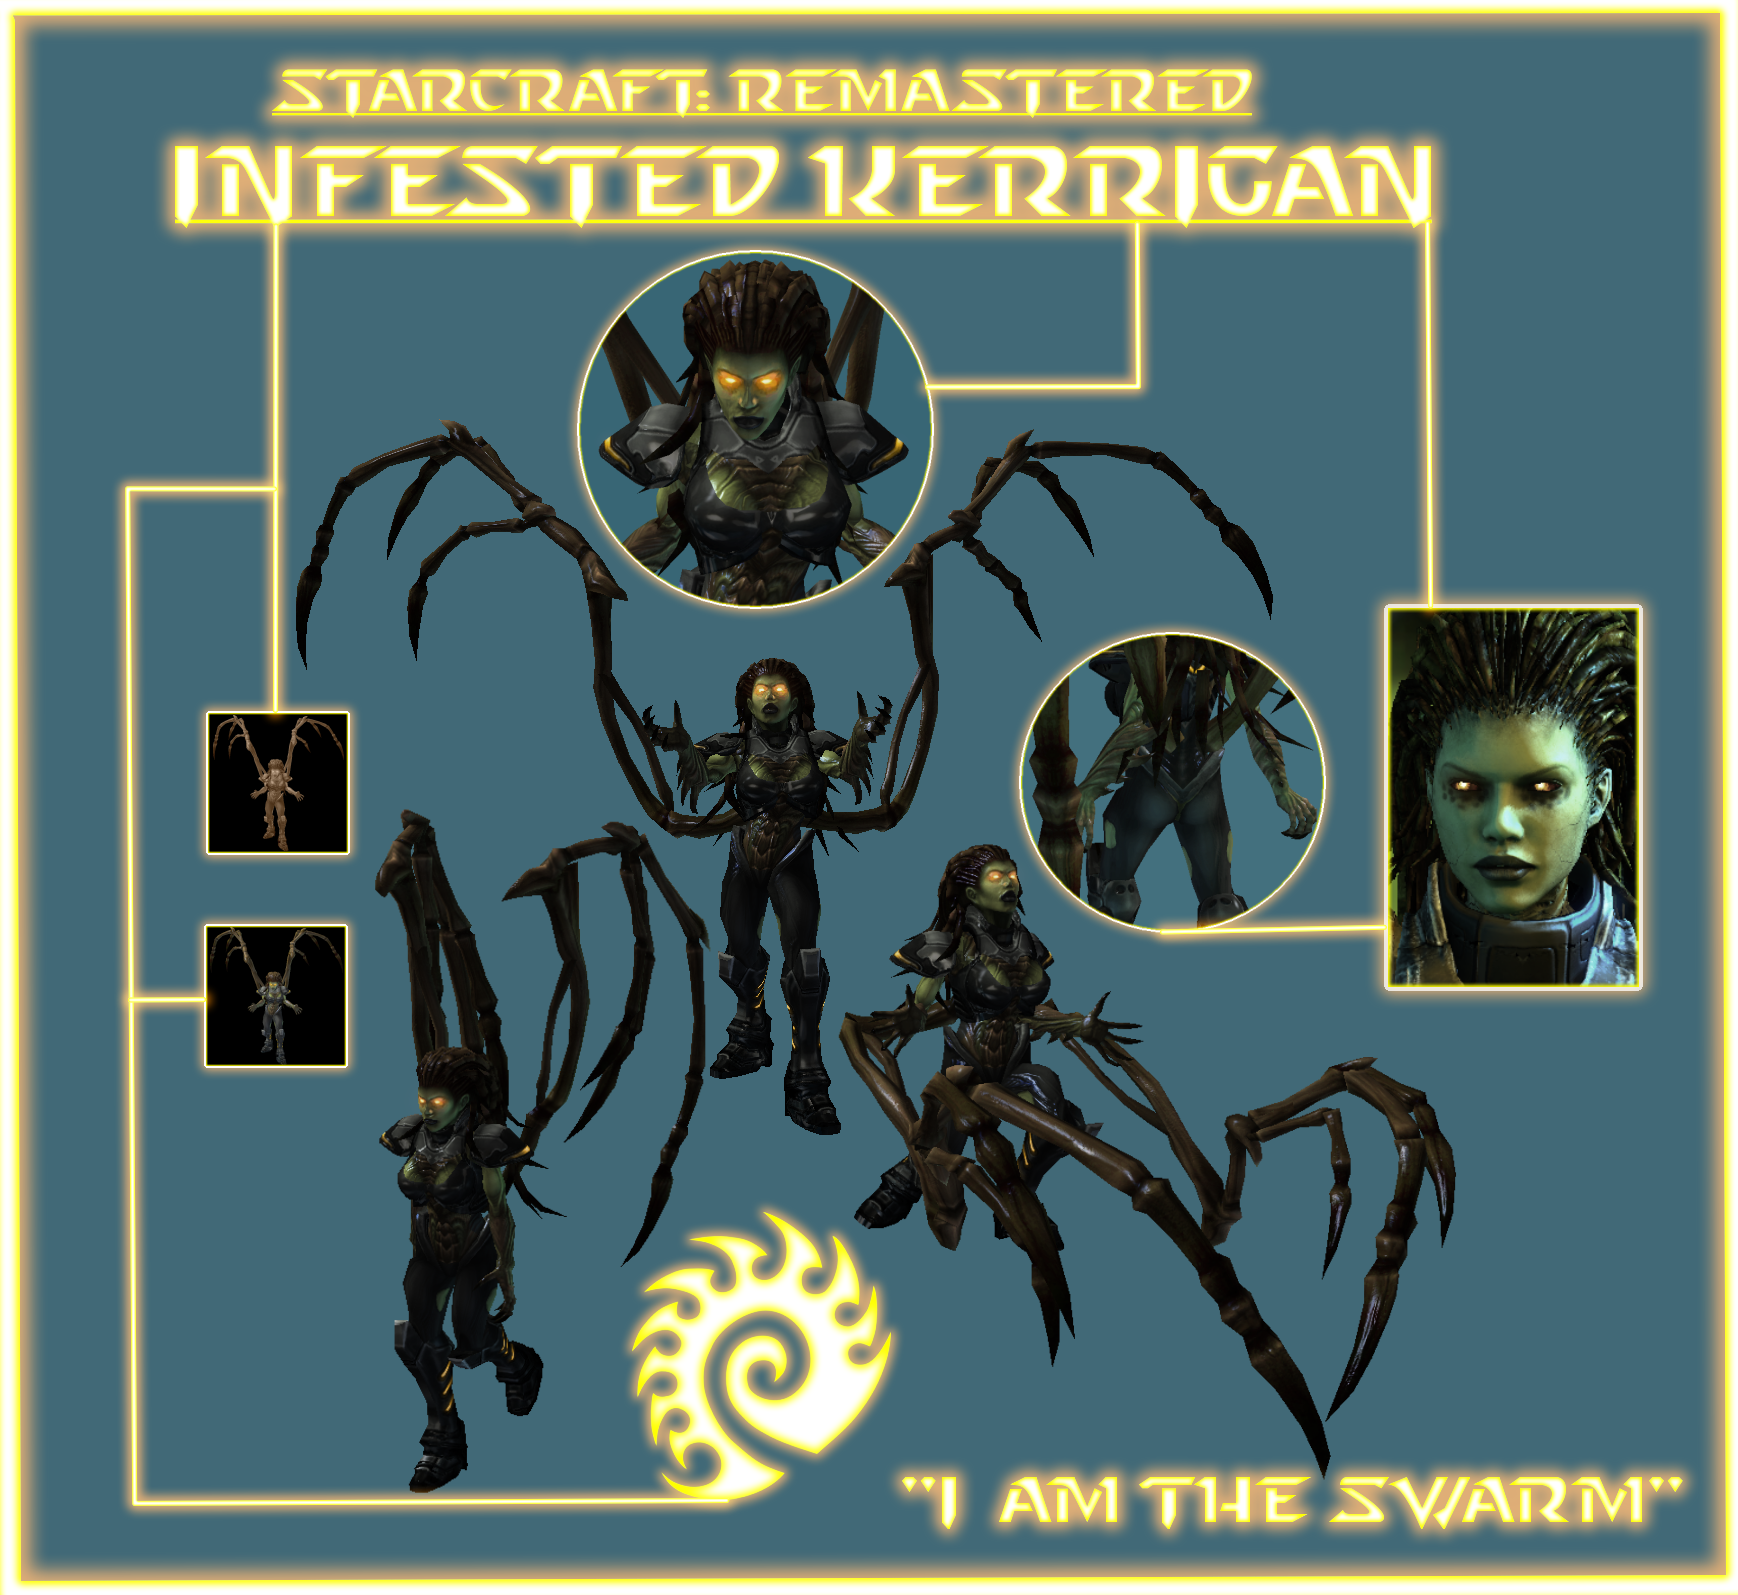 Remastered Kerrigan